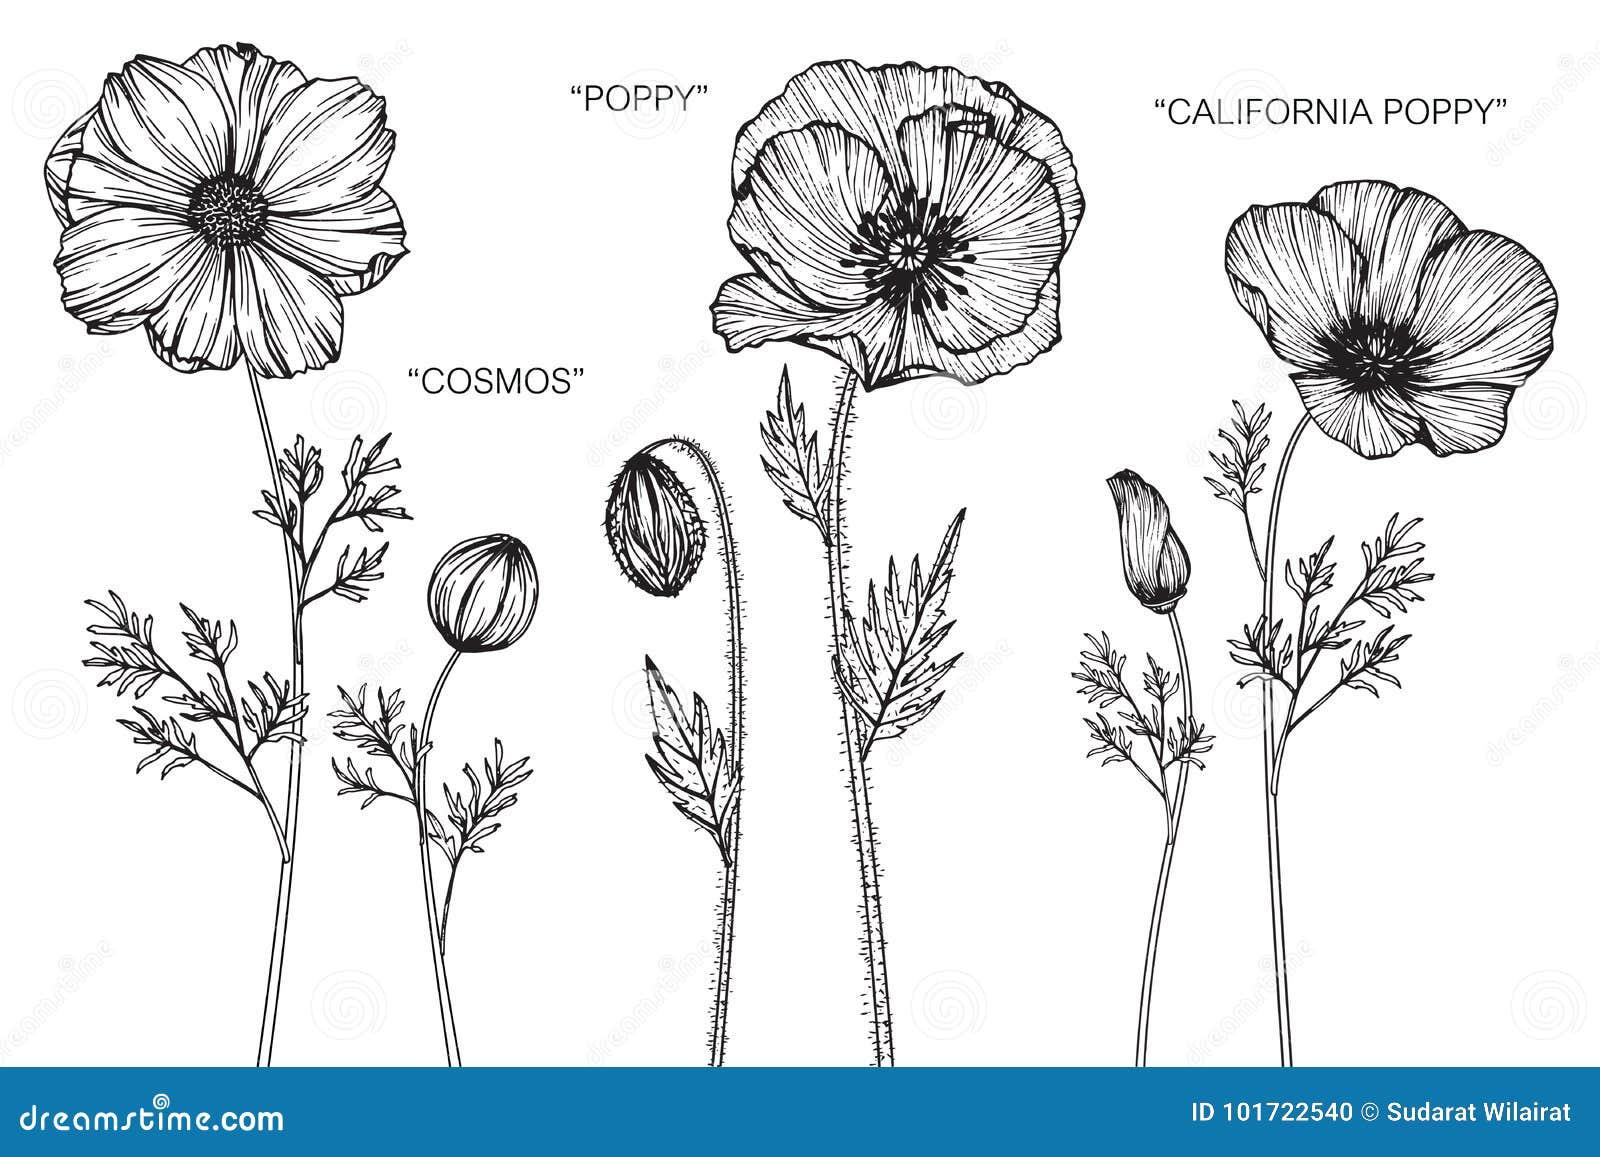 Cosmos Poppy California Poppy Flower Drawing And Sketch Stock